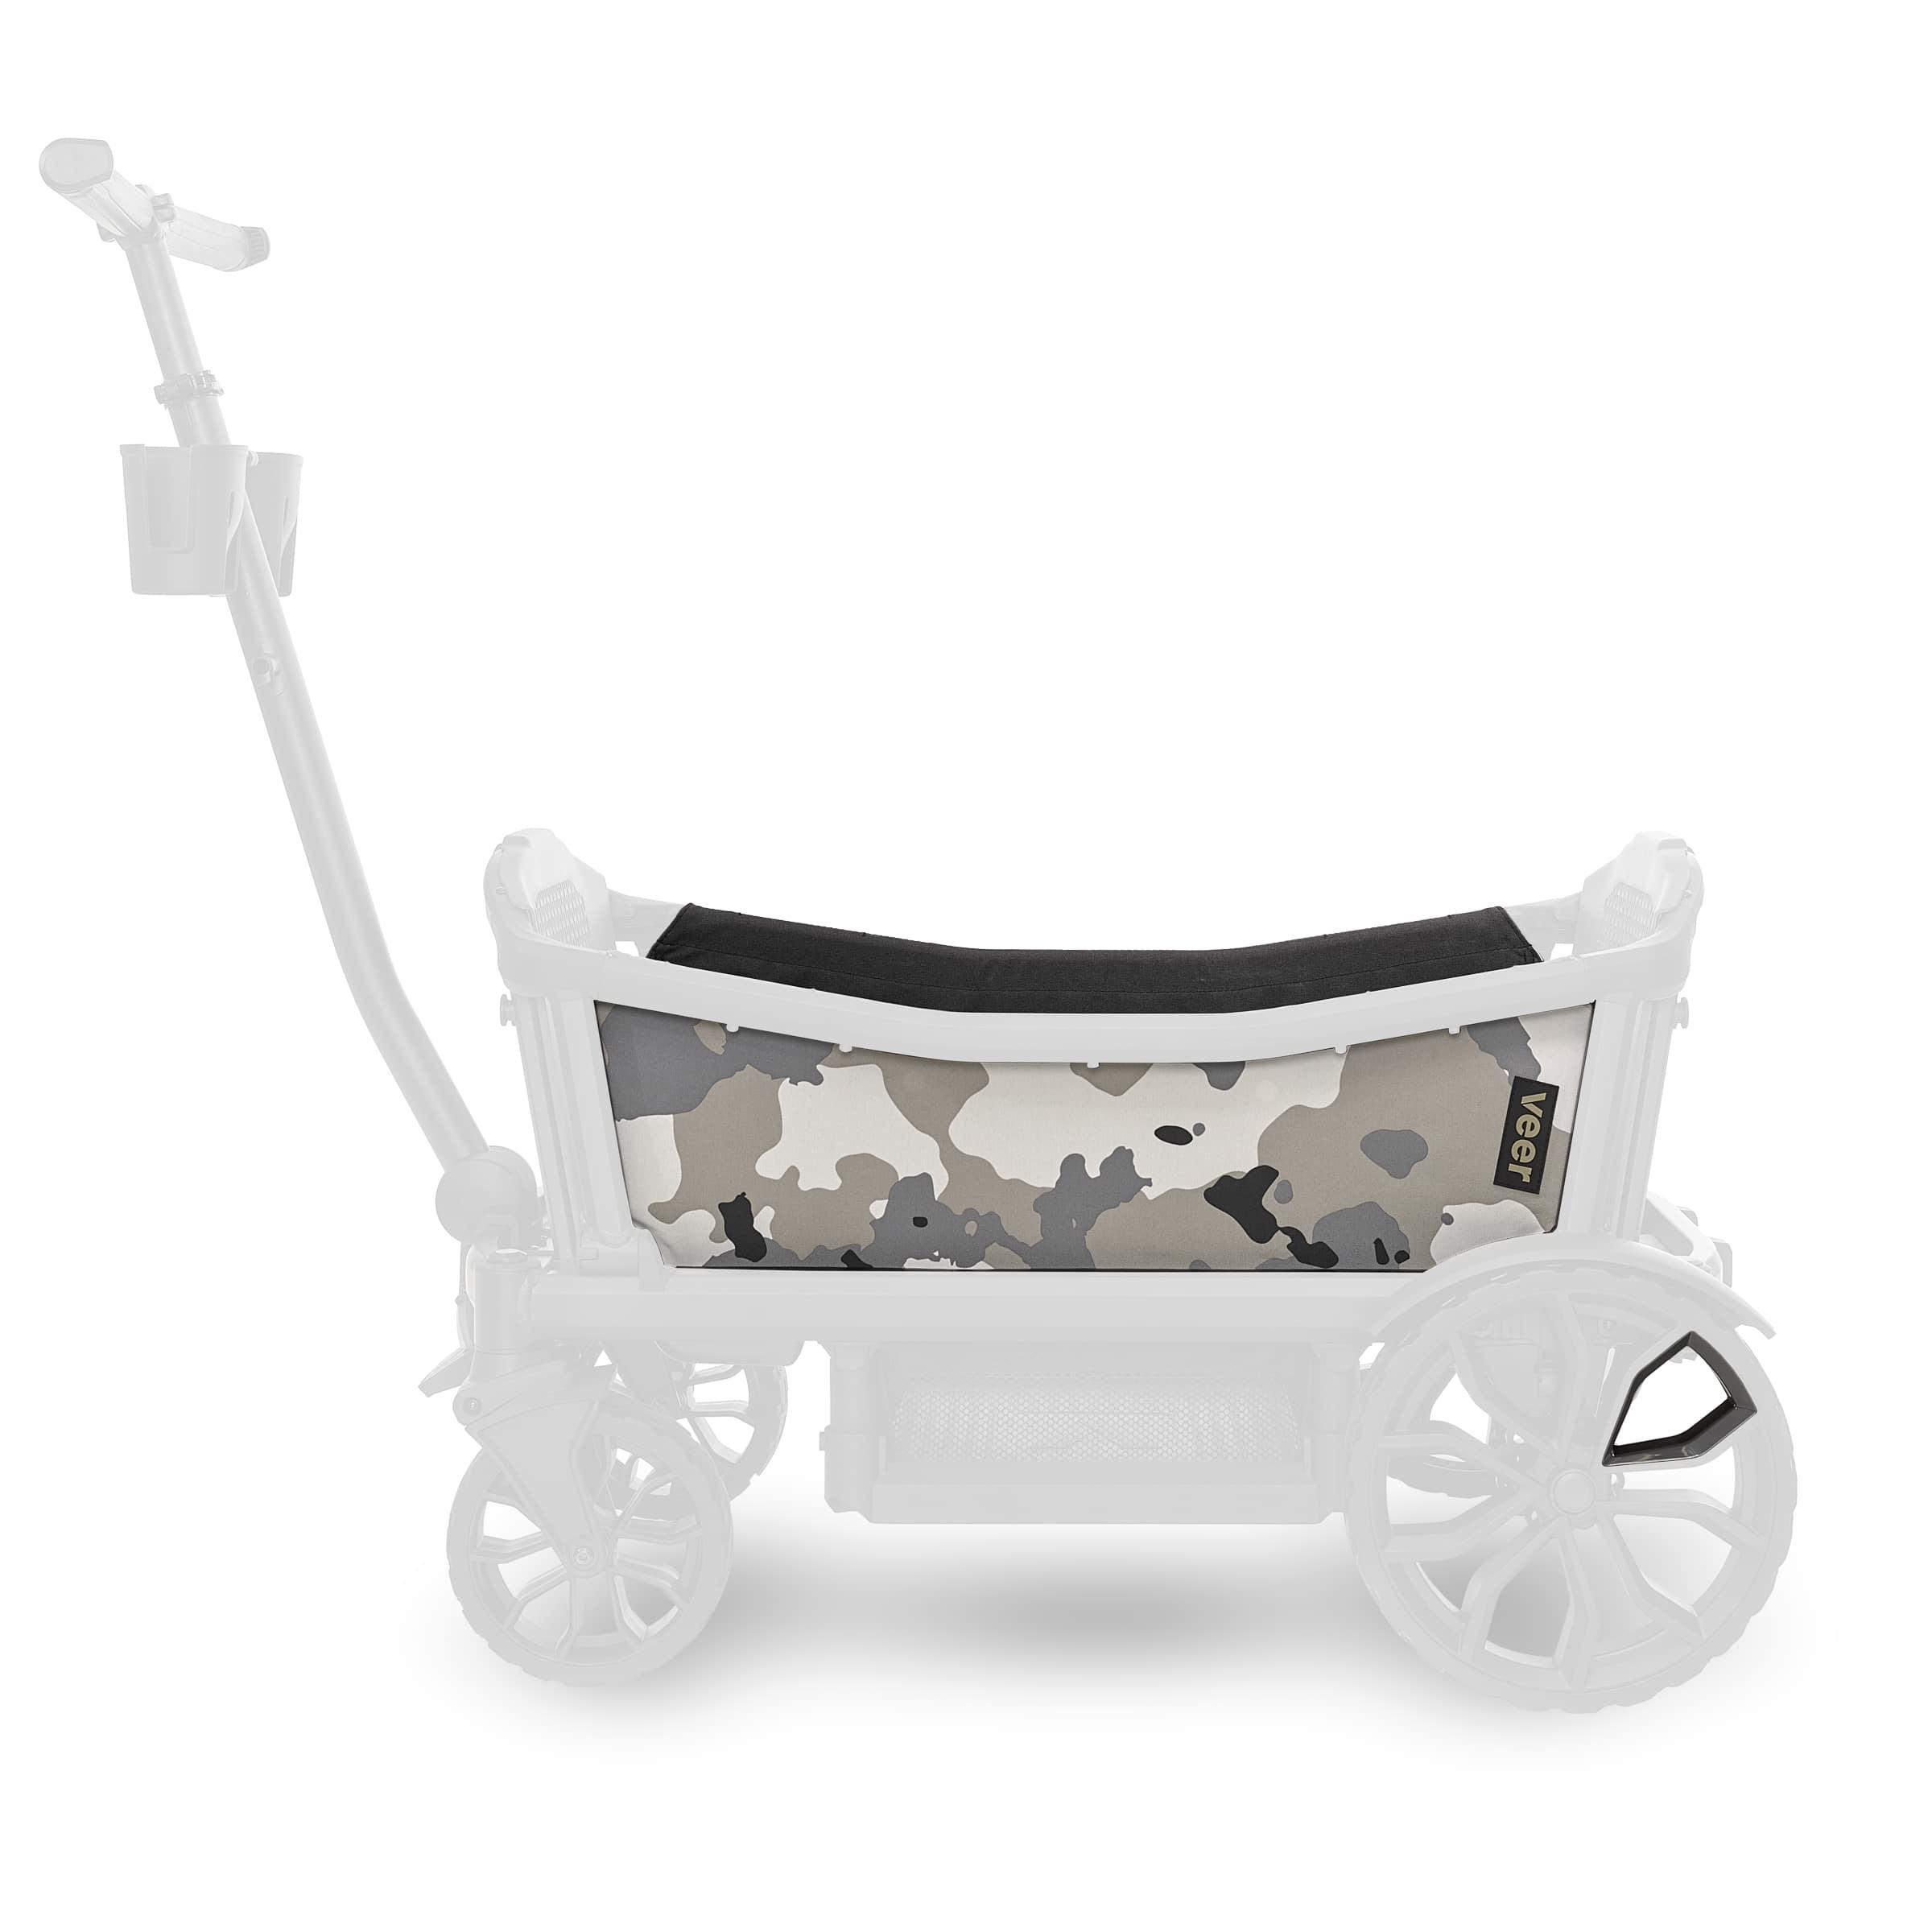 樂享學,ofami,嬰兒車,nikimotion,accessory